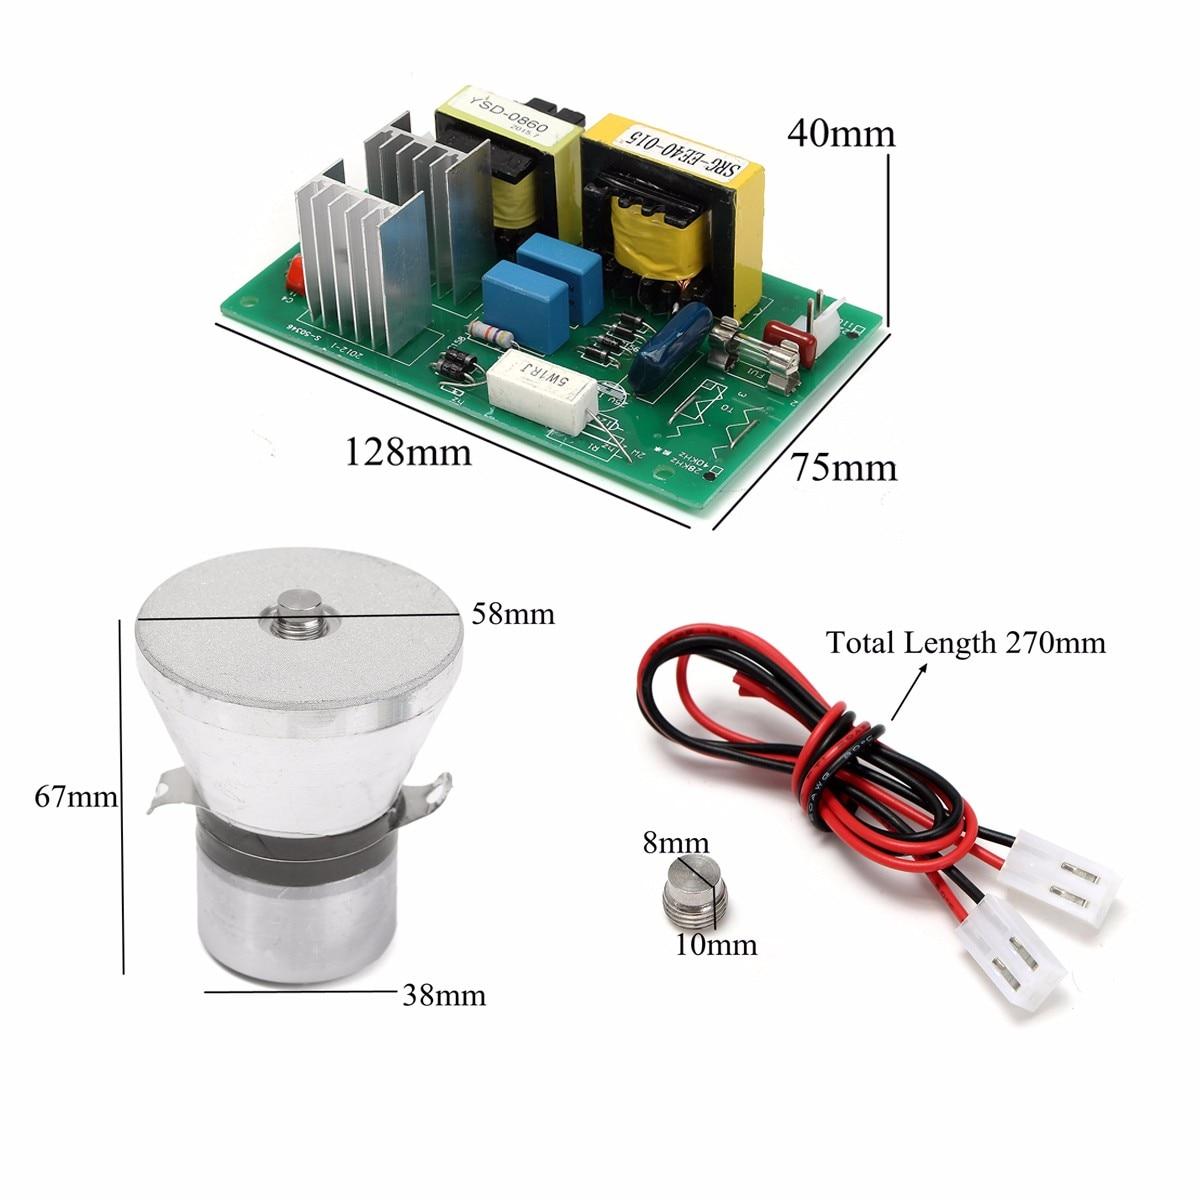 100 Watt 28 KHz Ultraschall Reinigungswandler Reiniger hochleistungs ...